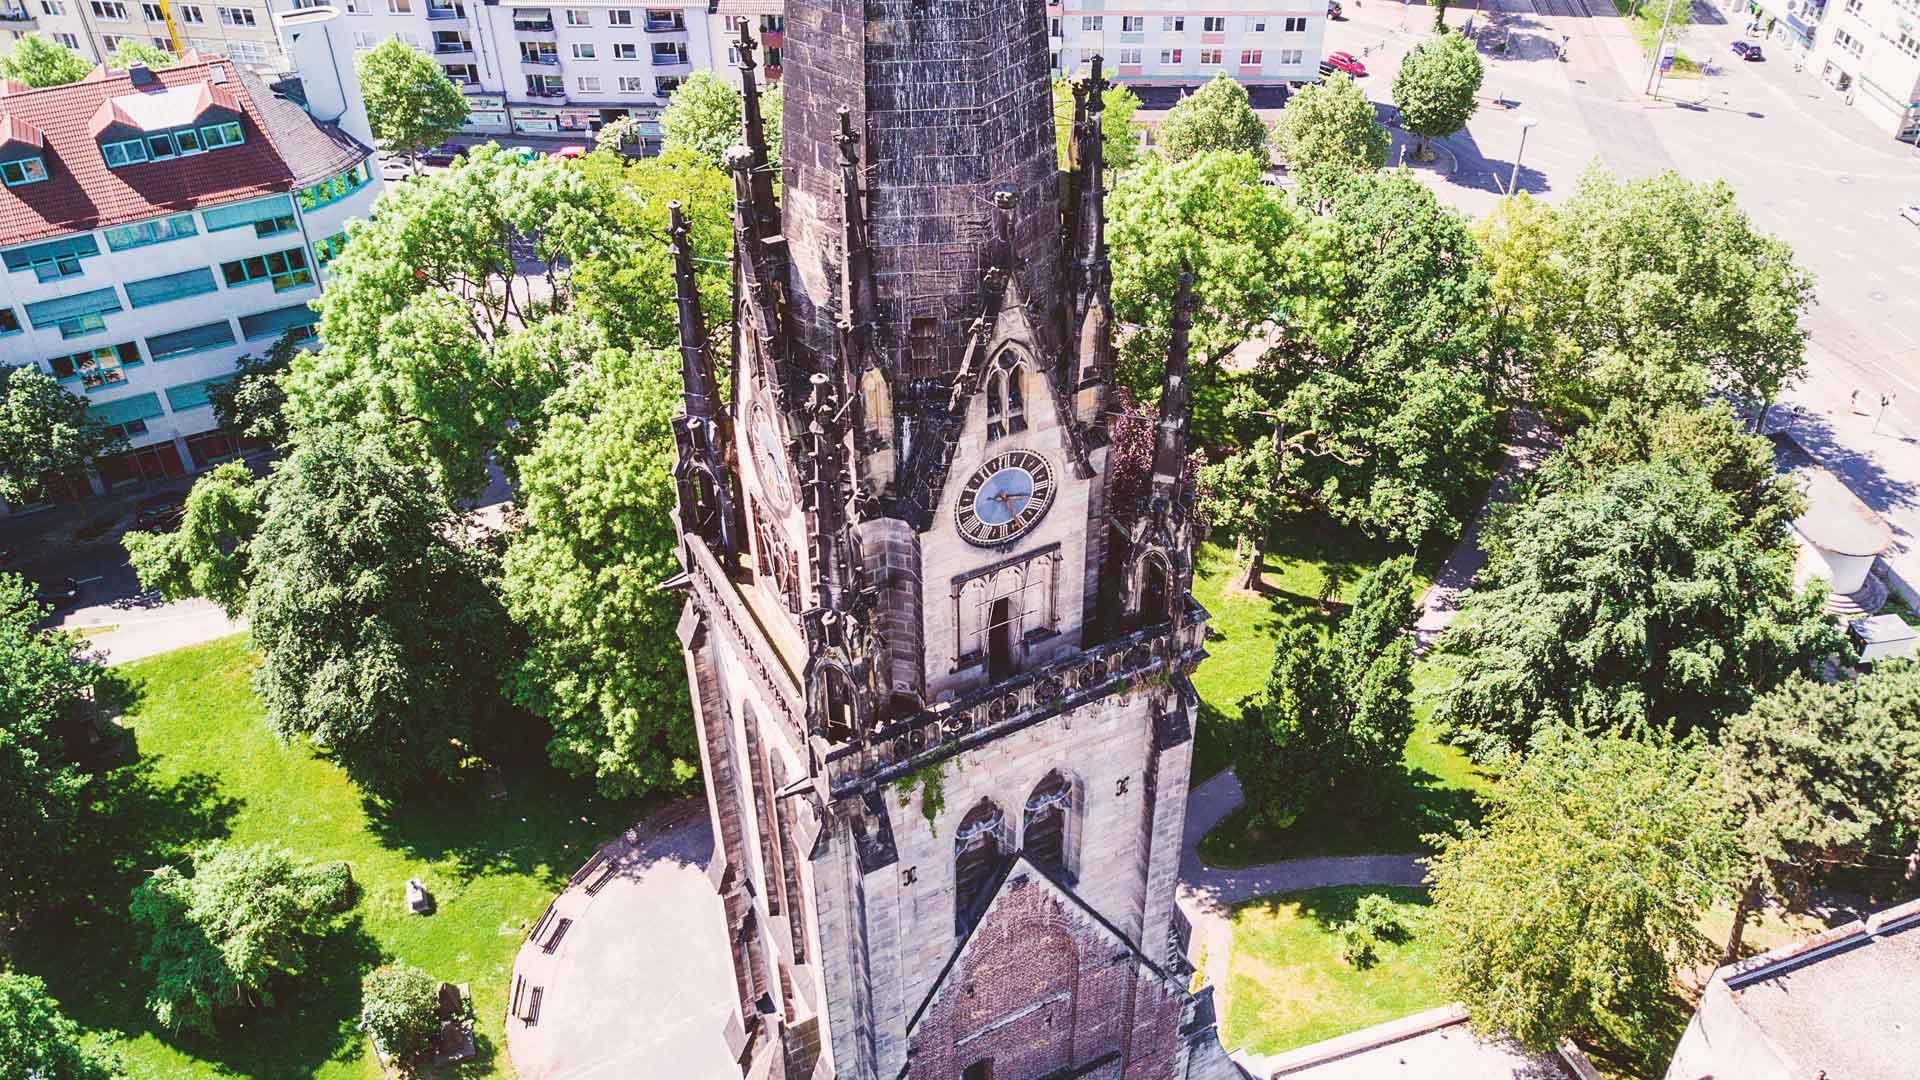 Lutherturm